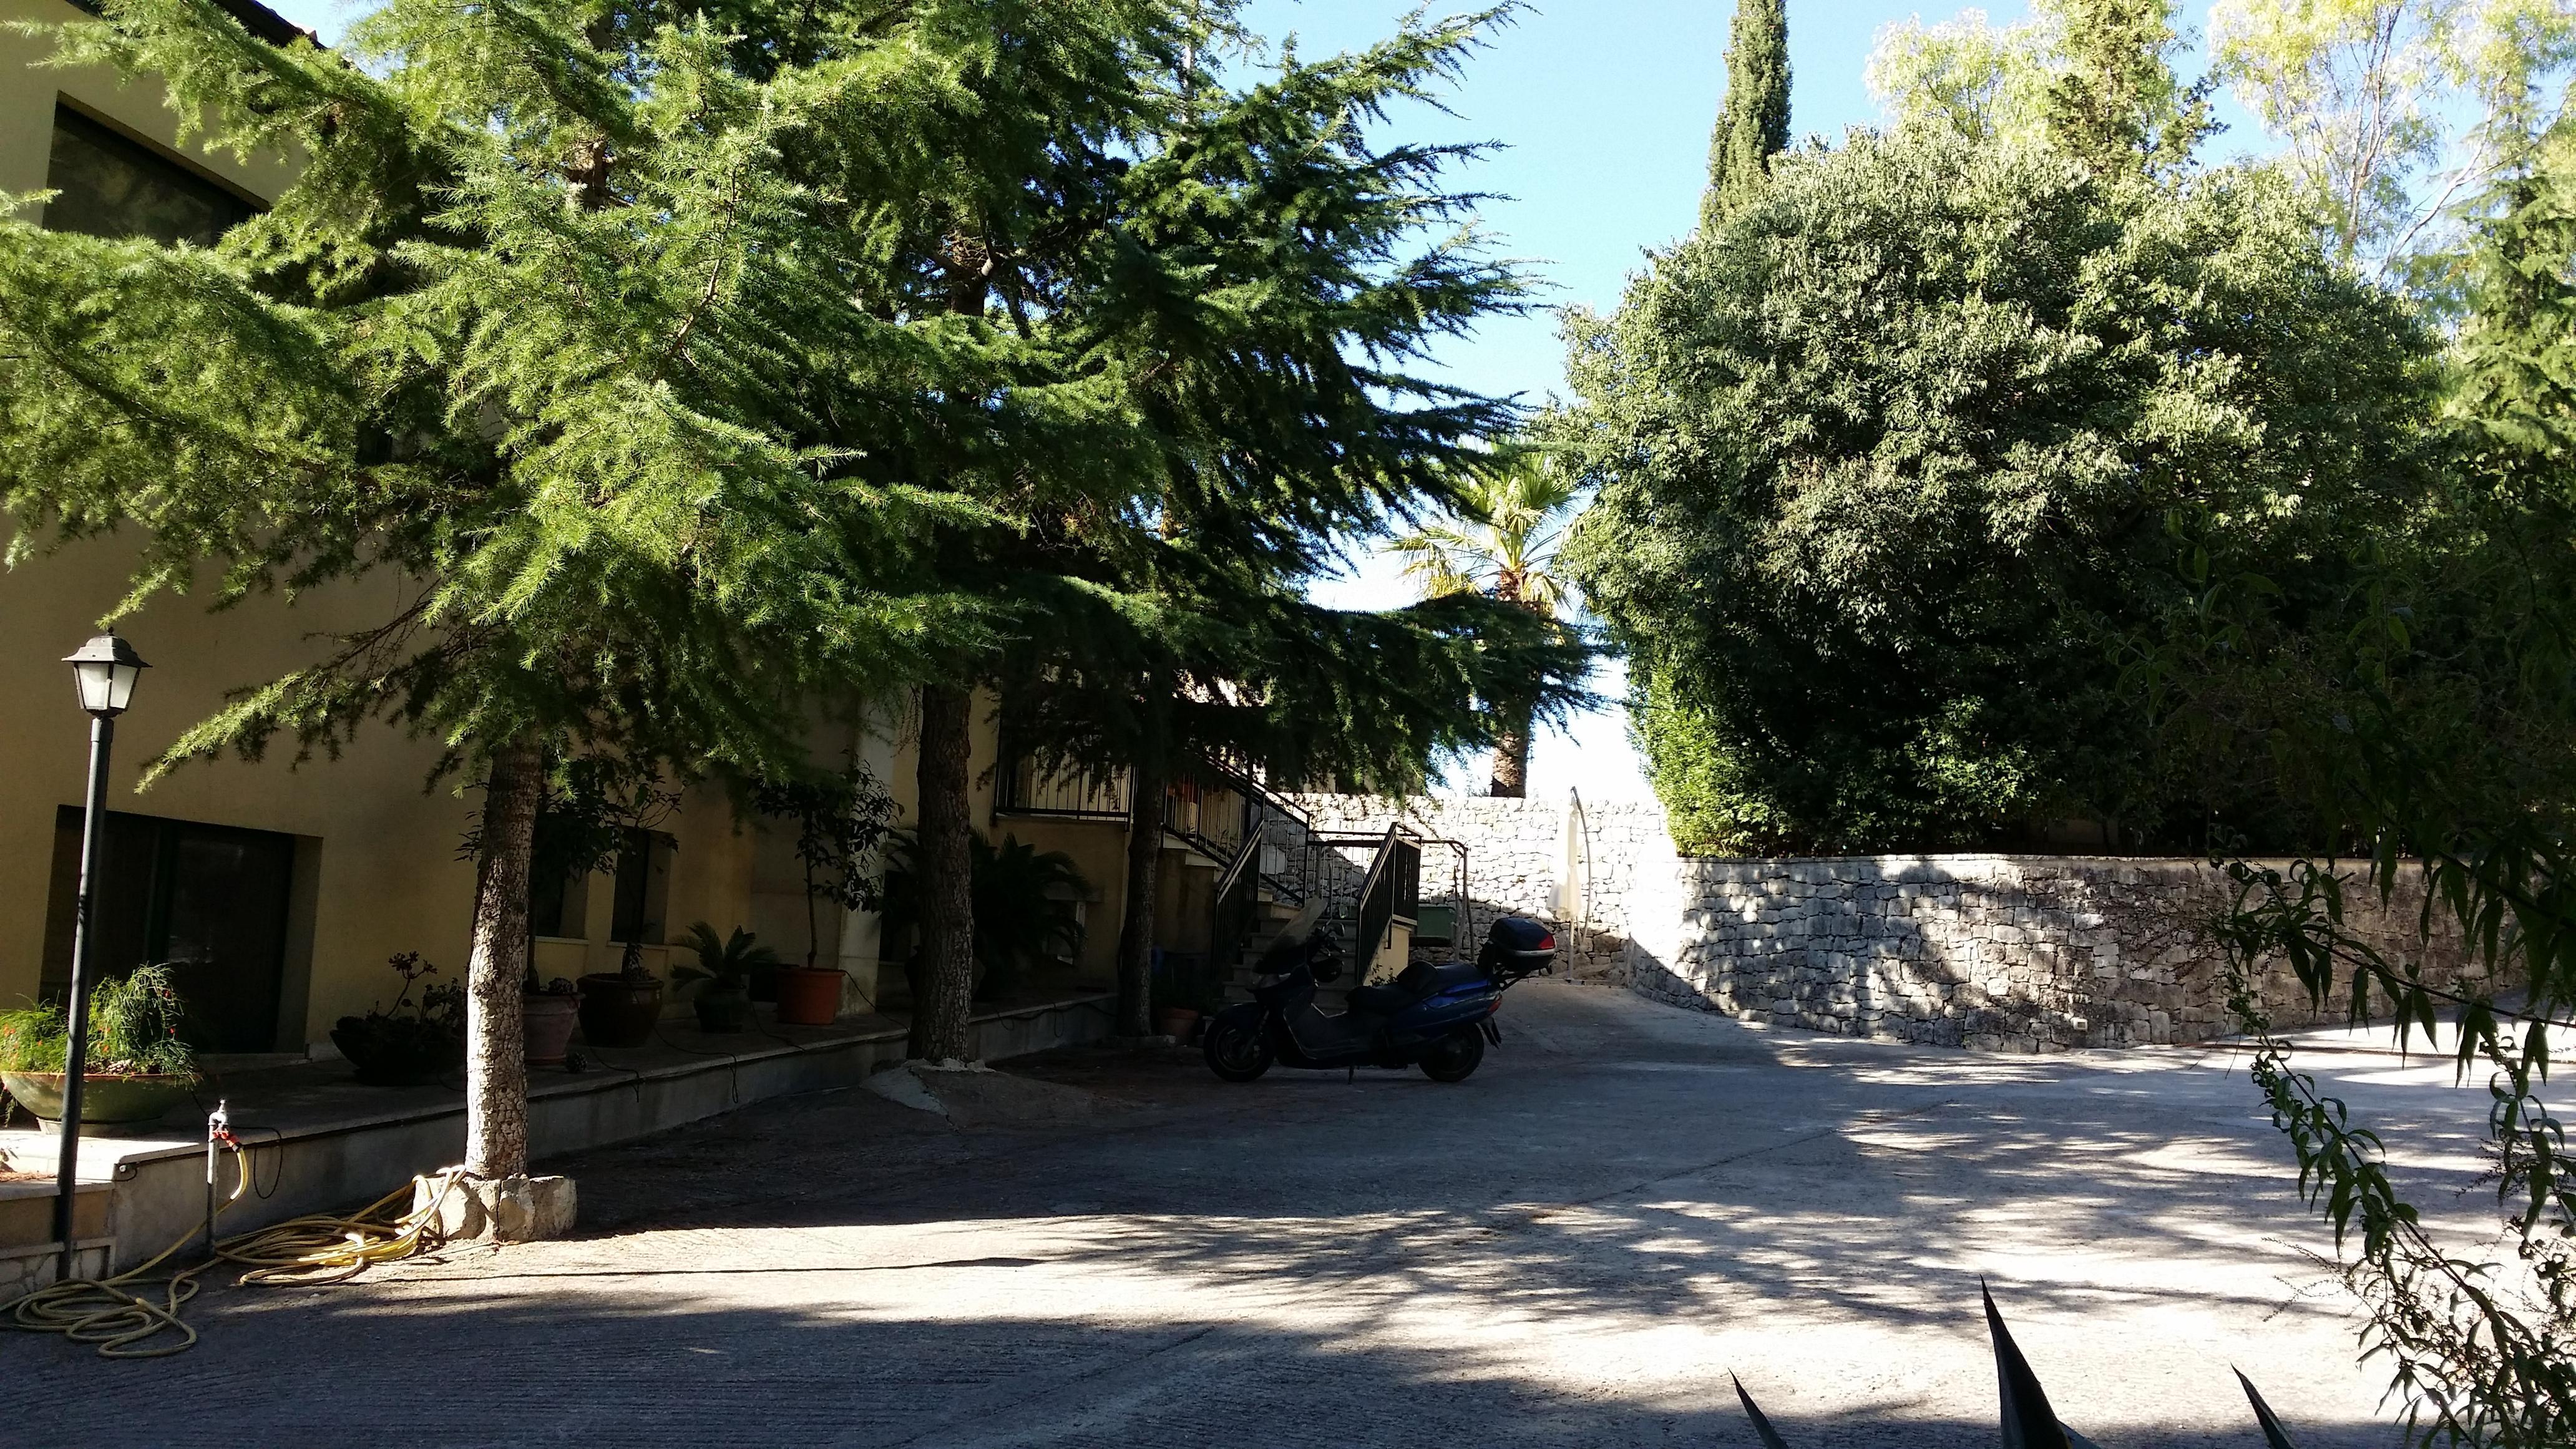 Appartement de vacances Carrubo (1730191), Modica, Ragusa, Sicile, Italie, image 22